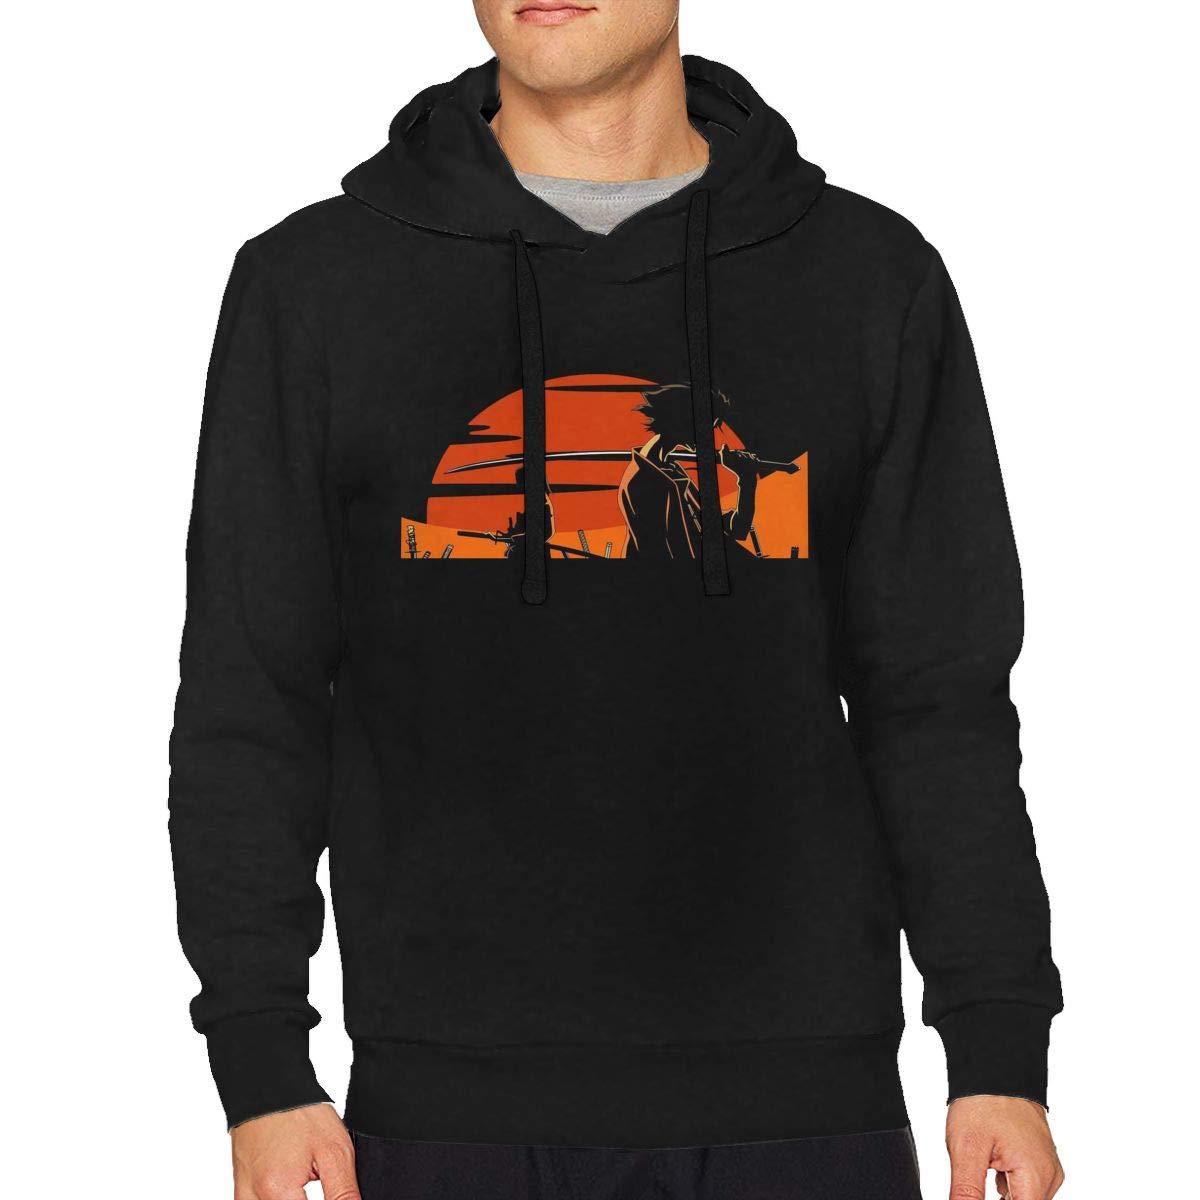 Mans Samurai Champloo Fashion Drawstring Music Sweater Black Shirts